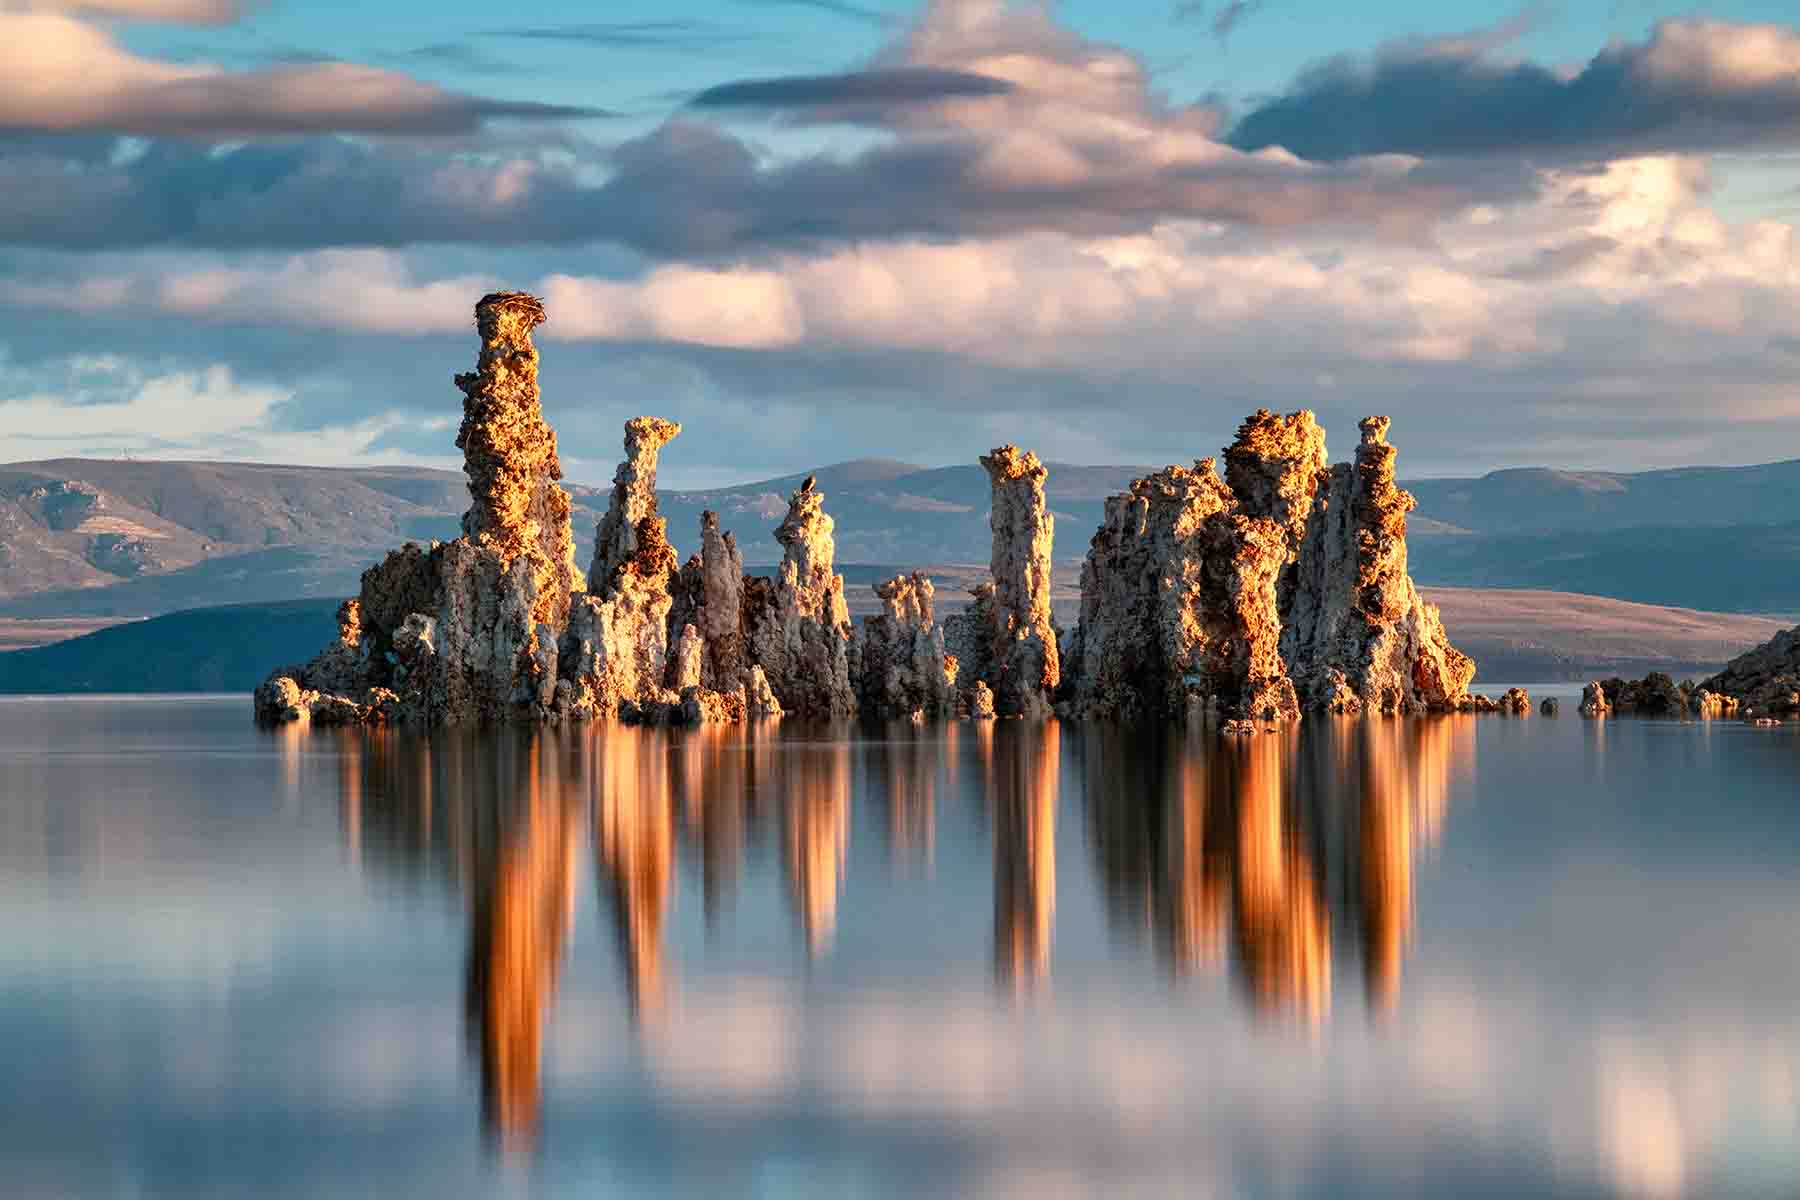 Limestone Tufa Towers at Mono Lake in California